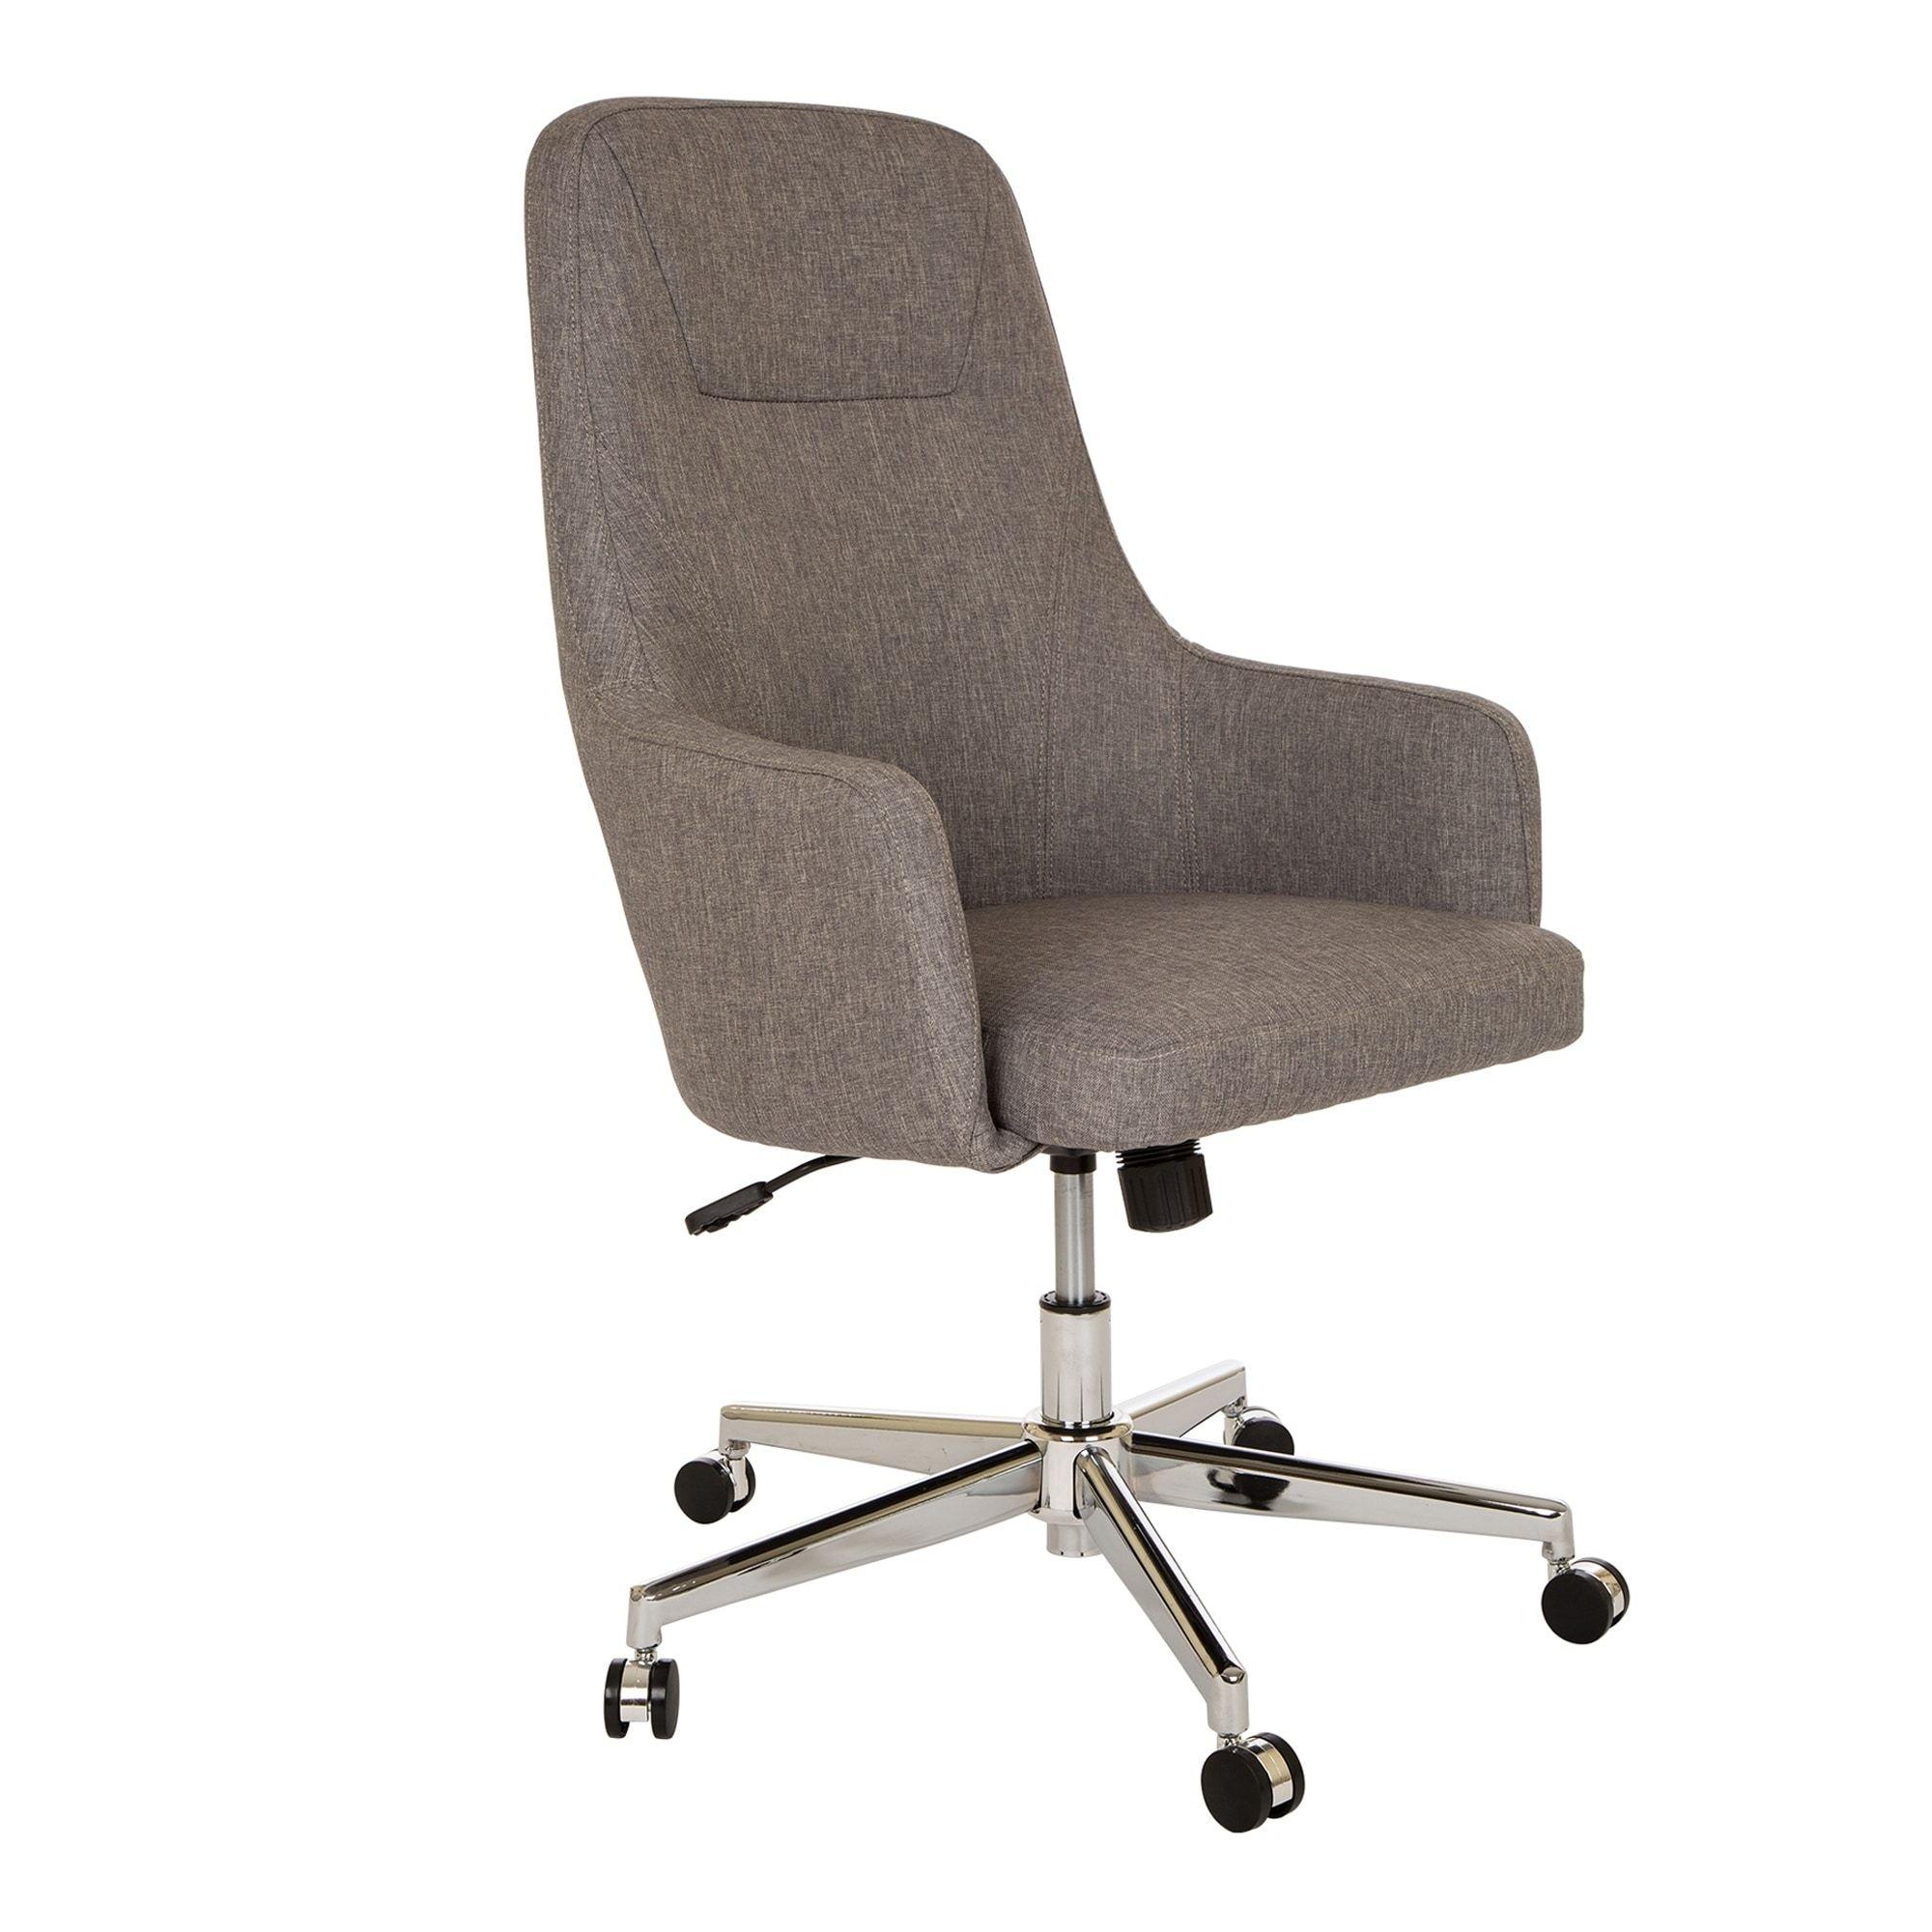 Vintage Pollock Desk Office Chair Knoll Mid Century Modern Leather